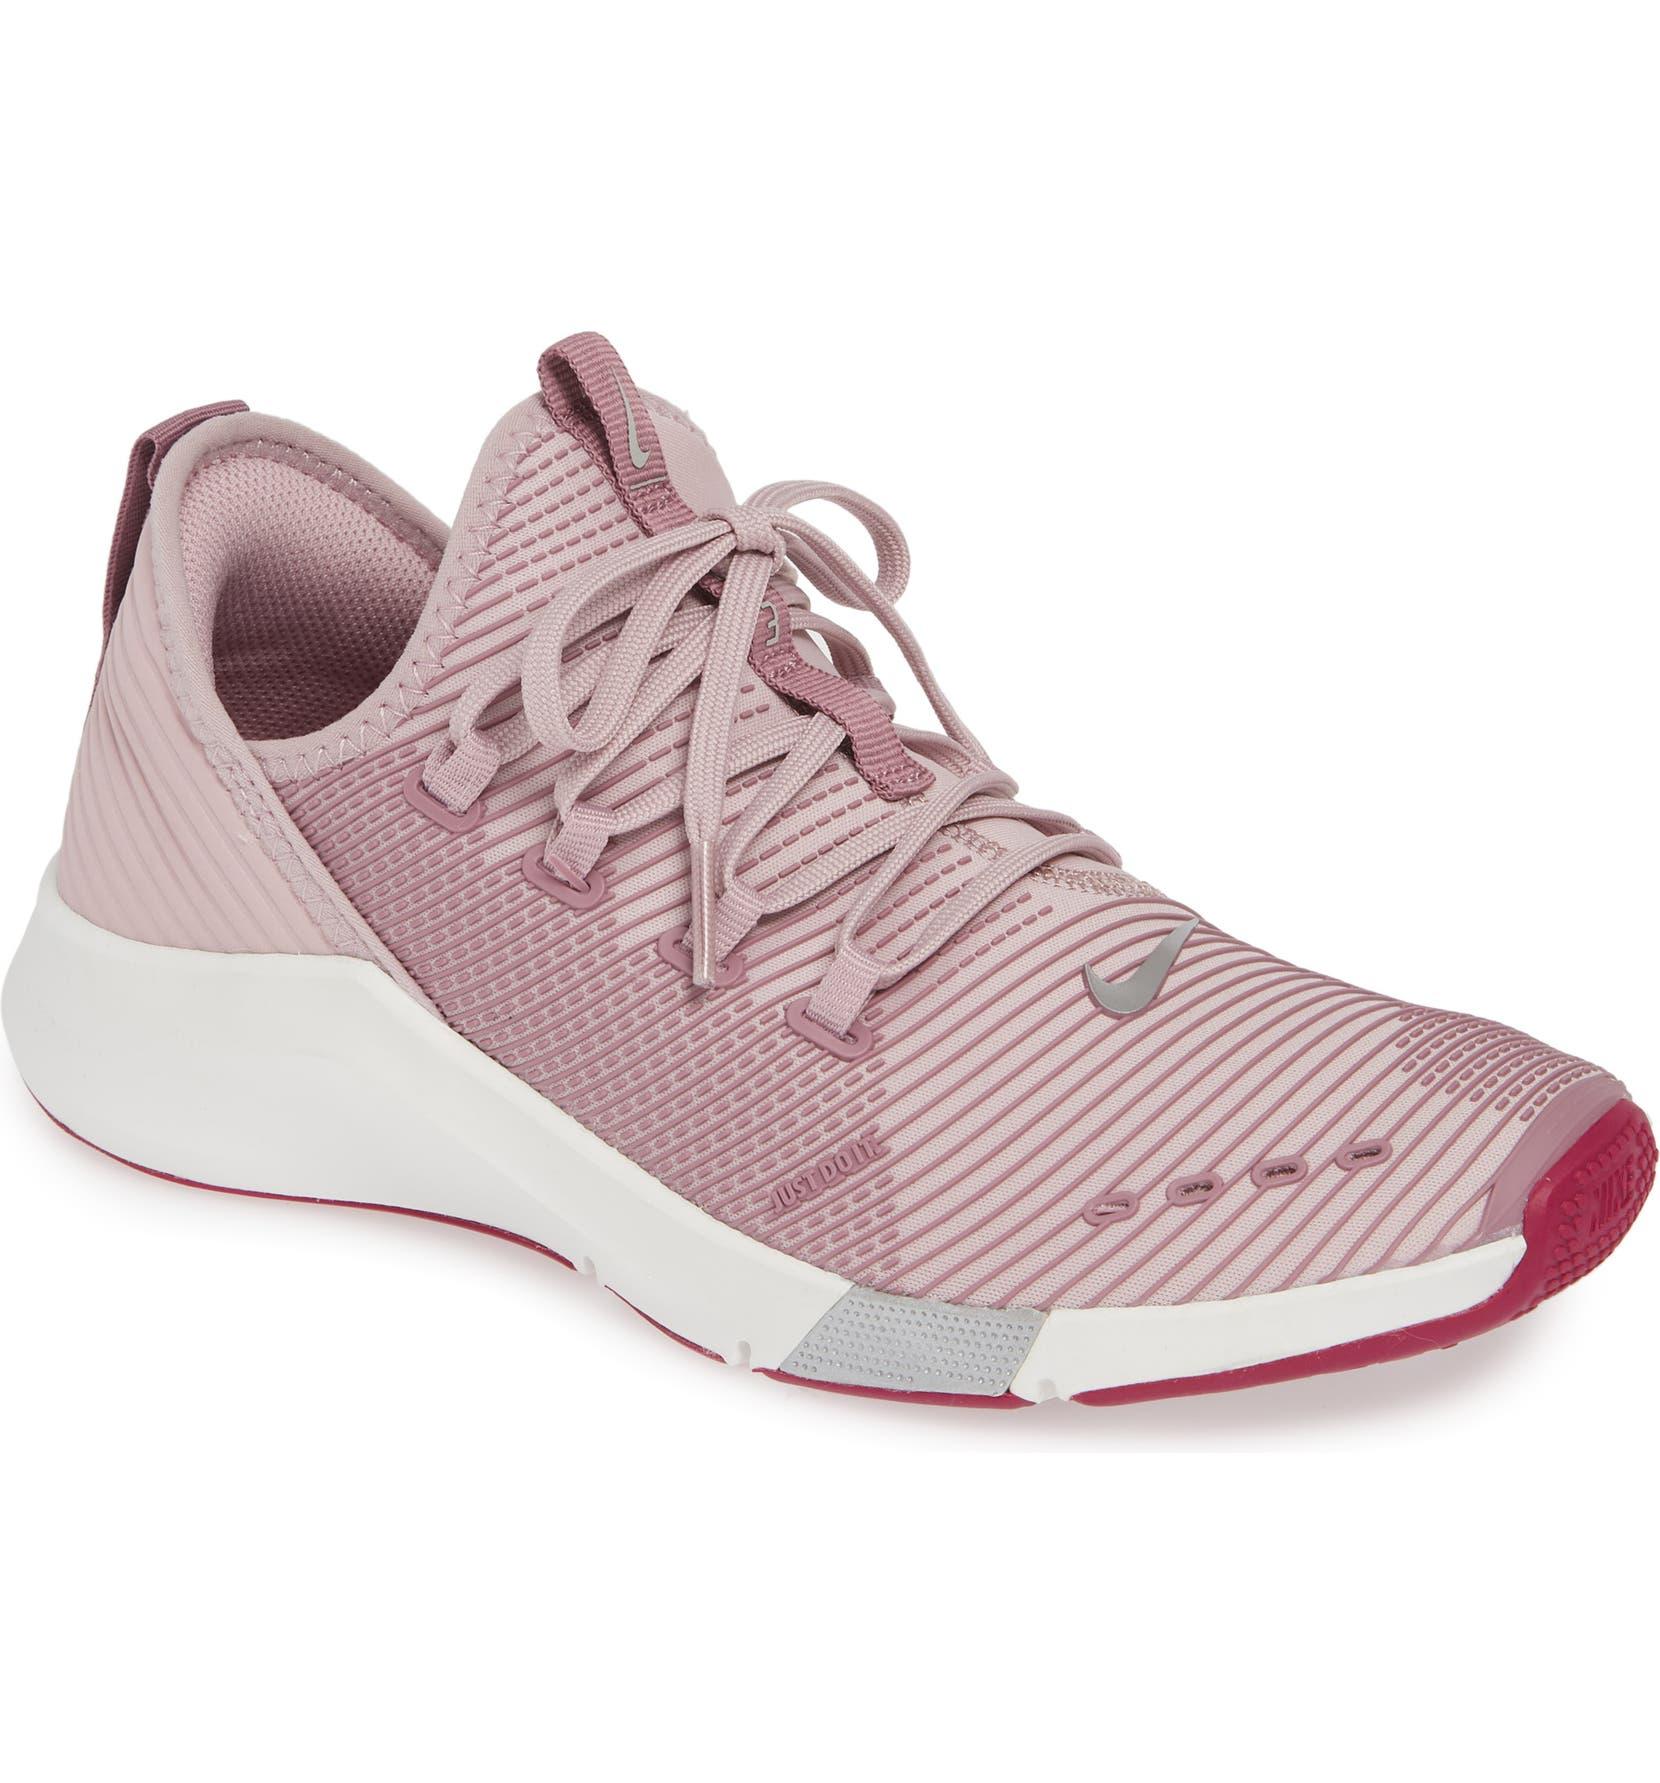 more photos 7e9c6 3adde Nike Air Zoom Elevate Training Shoe (Women)   Nordstrom